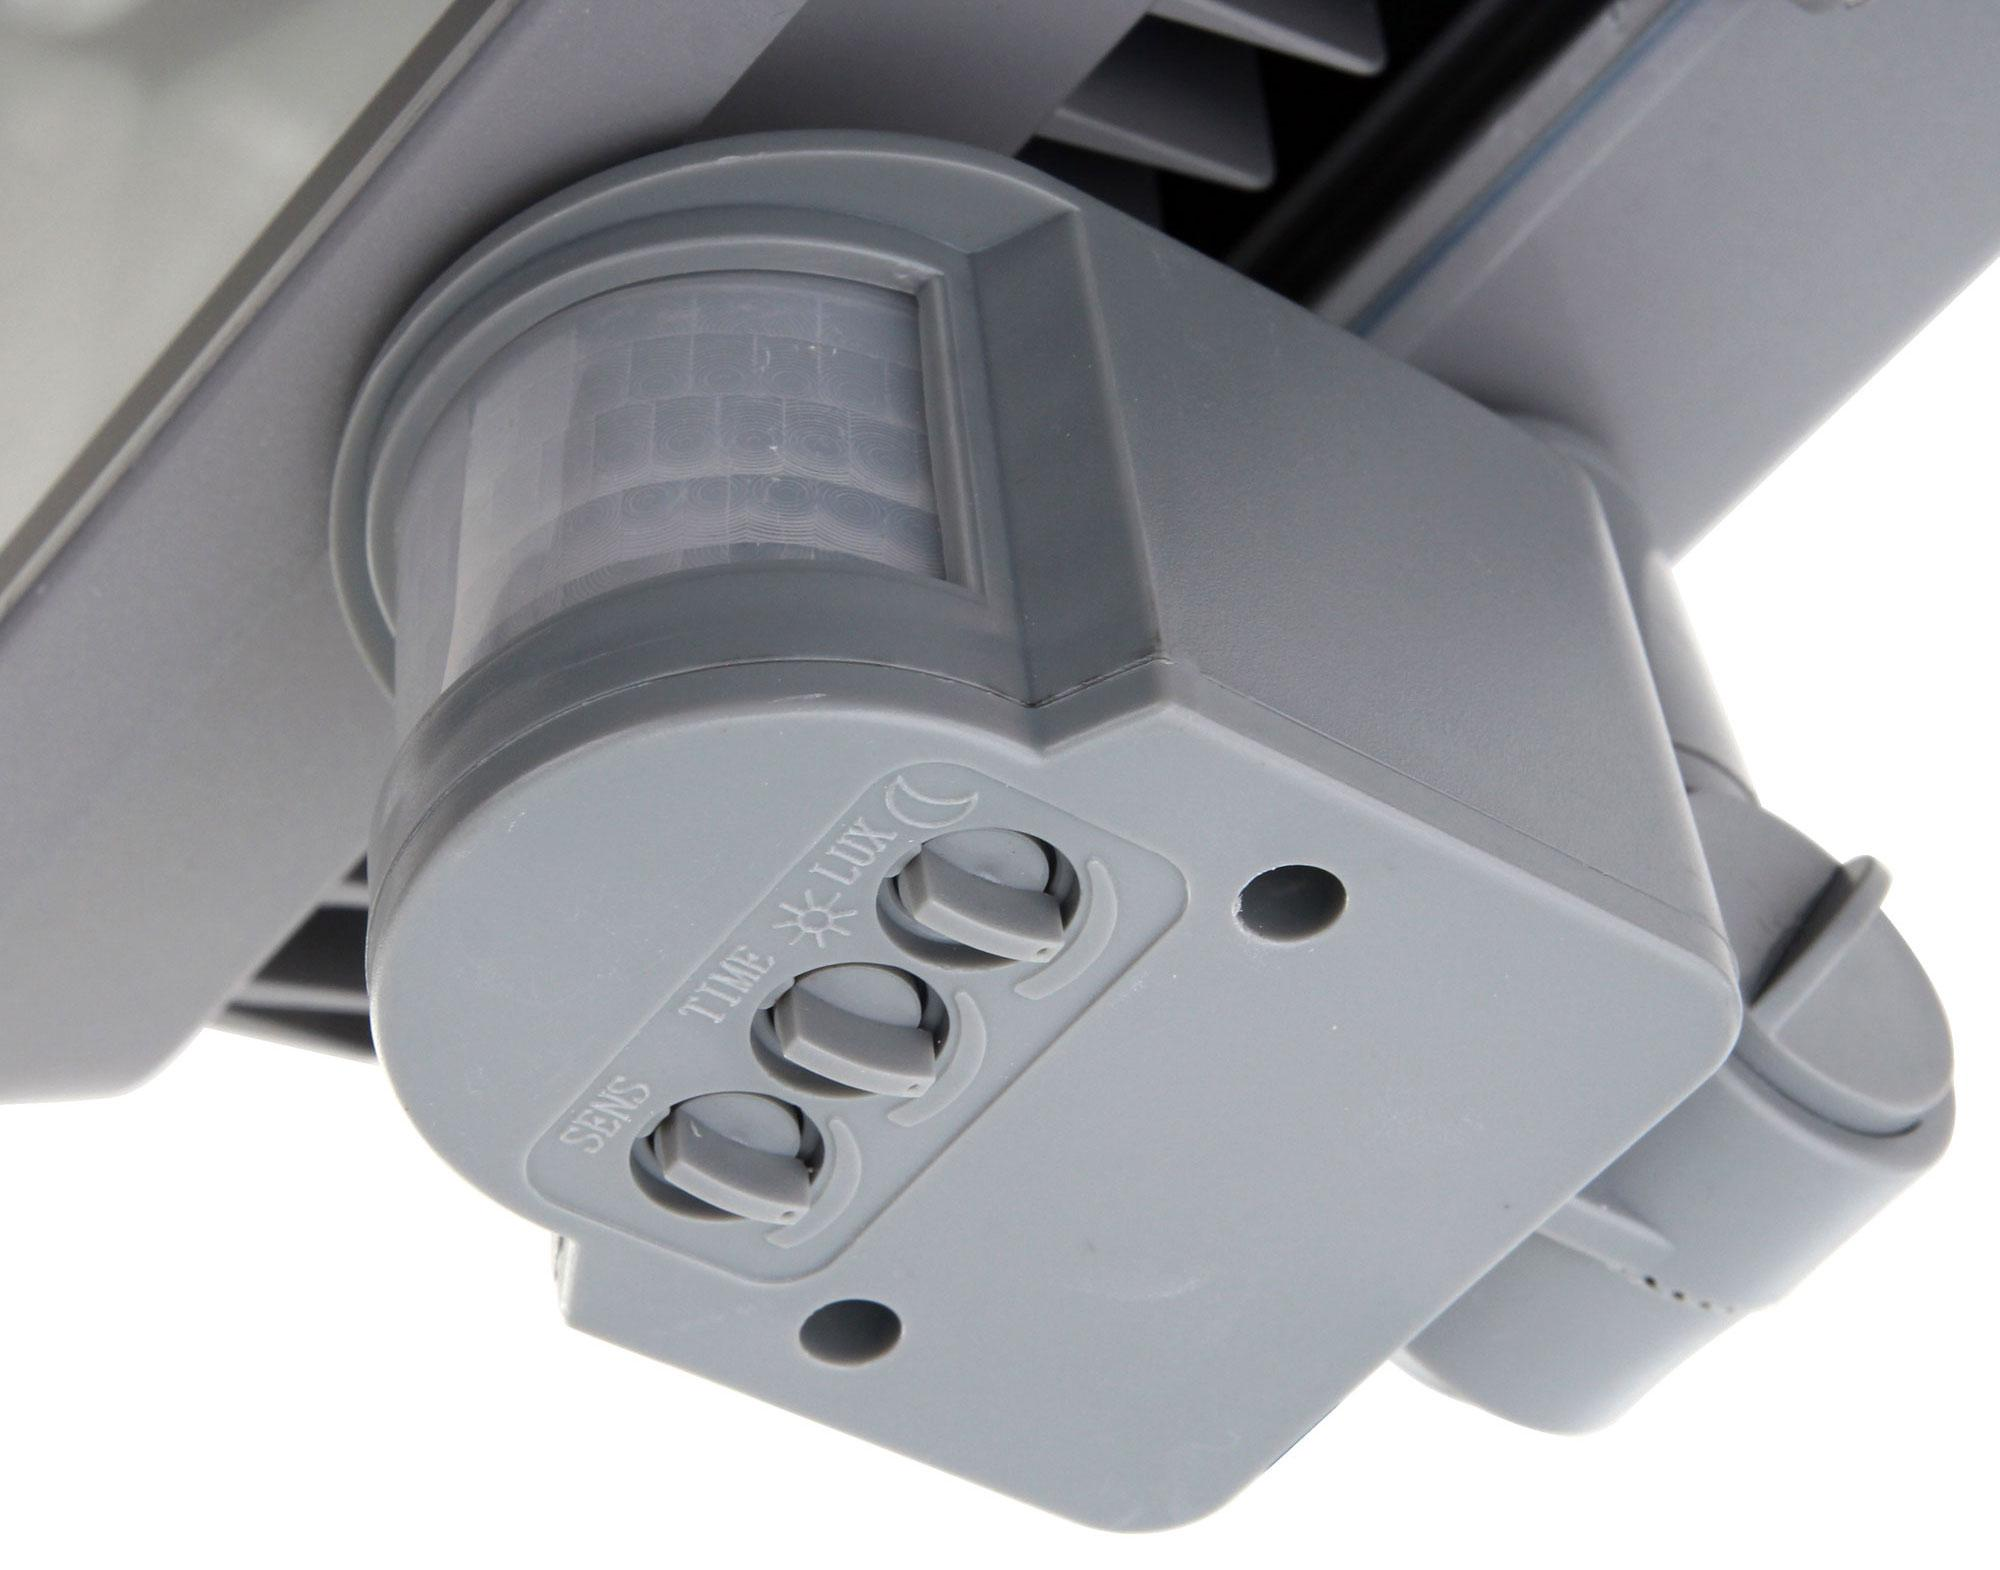 showlite fl 2020b led fluter ip65 20 watt 2200 lumen bewegungsmelder 5er set. Black Bedroom Furniture Sets. Home Design Ideas